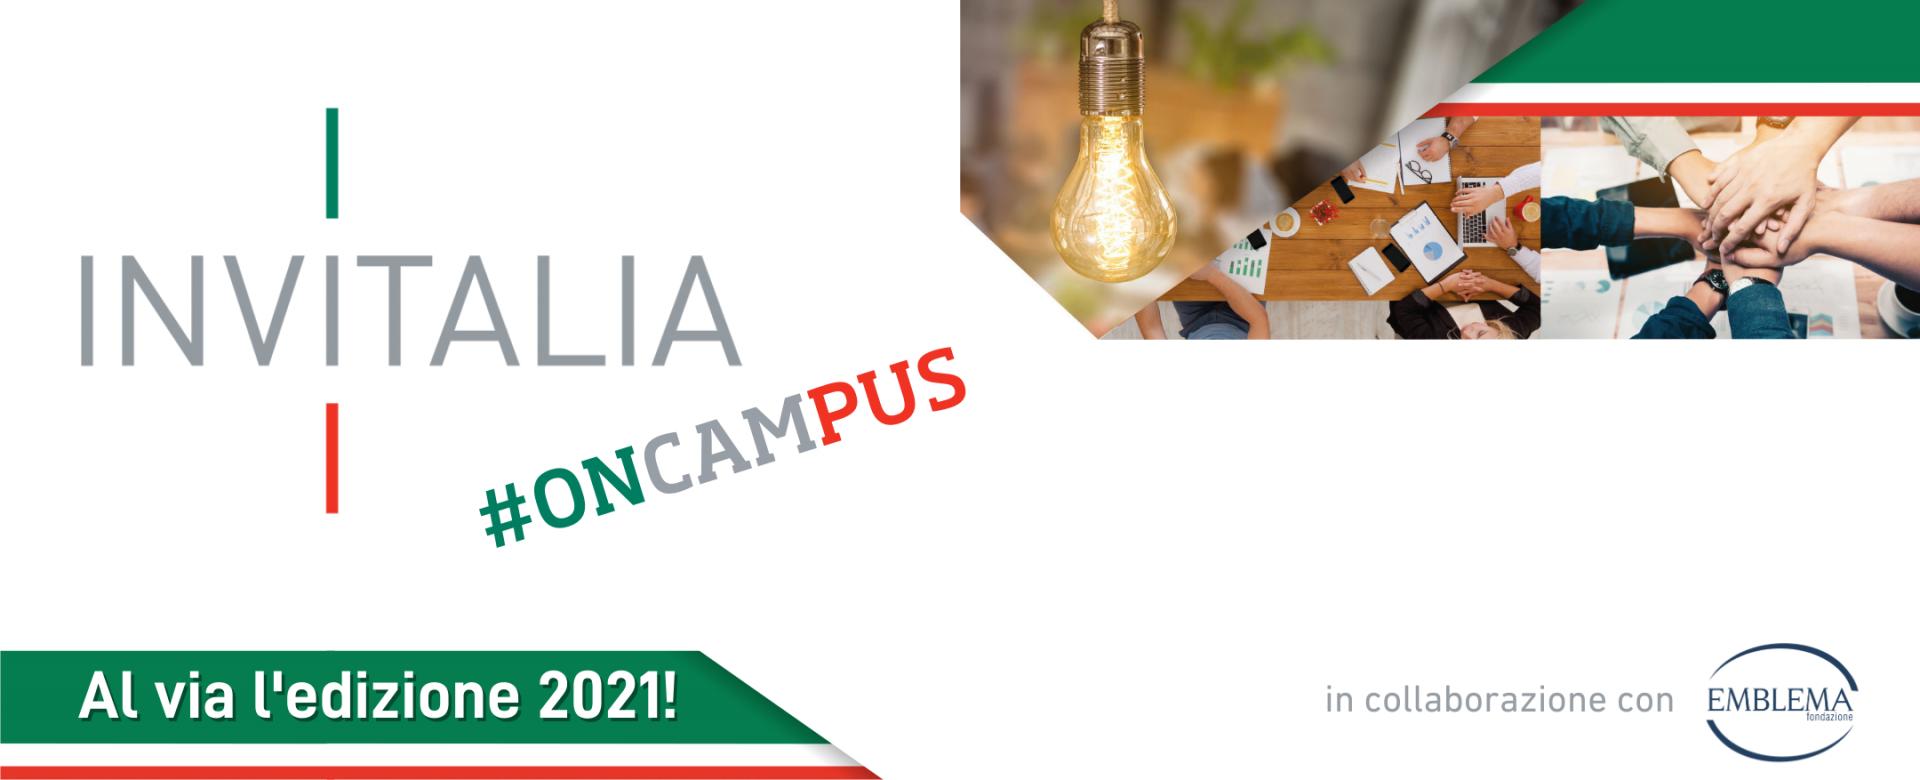 14.04.2021 - Torna Invitalia #onCampus!